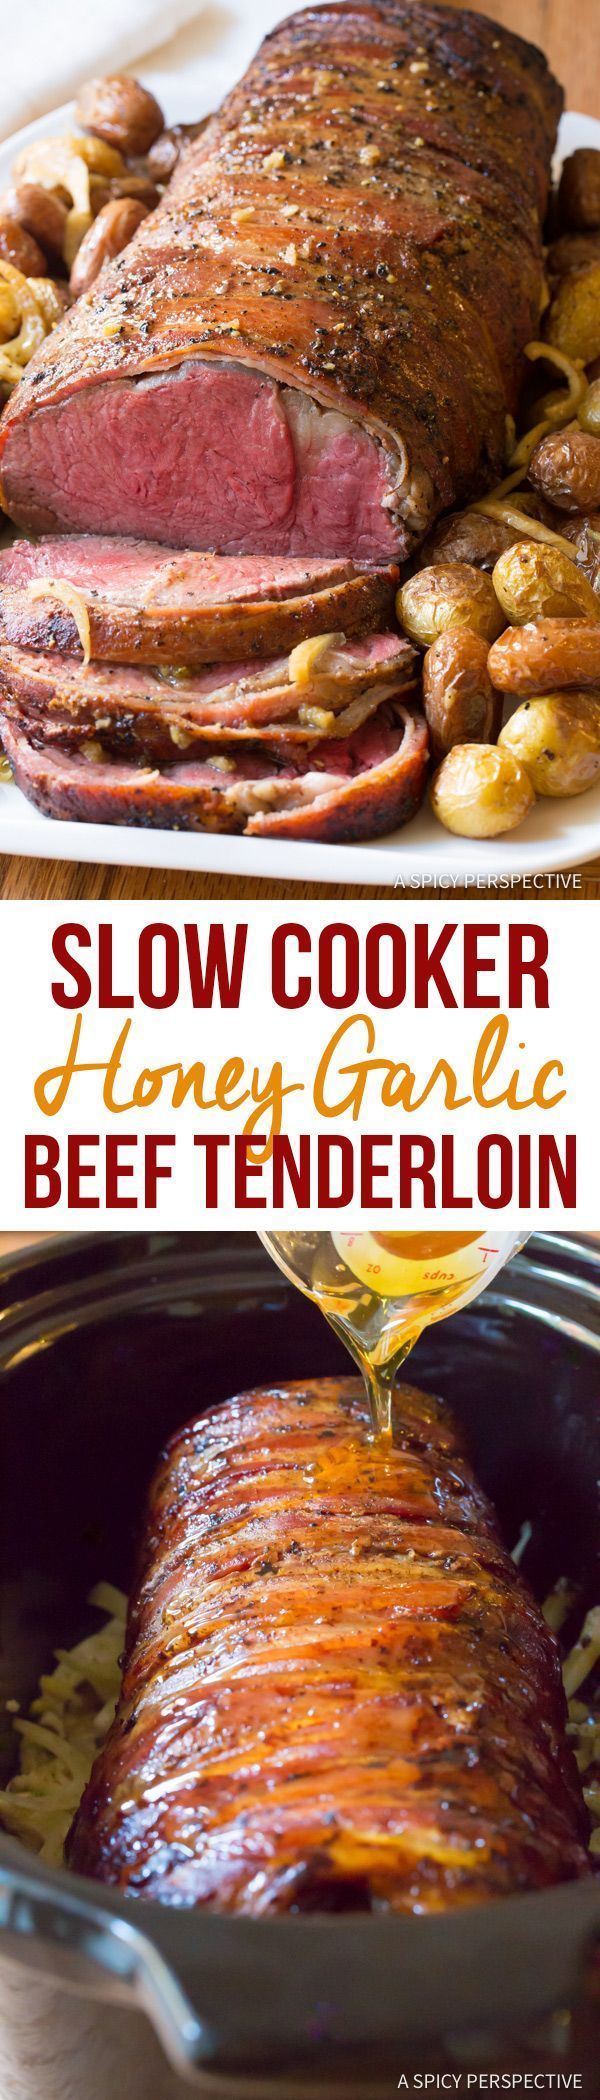 Fabulous Slow Cooker Honey Garlic Beef Tenderloin Recipe | http://ASpicyPerspective.com #holiday #christmas #crockpot